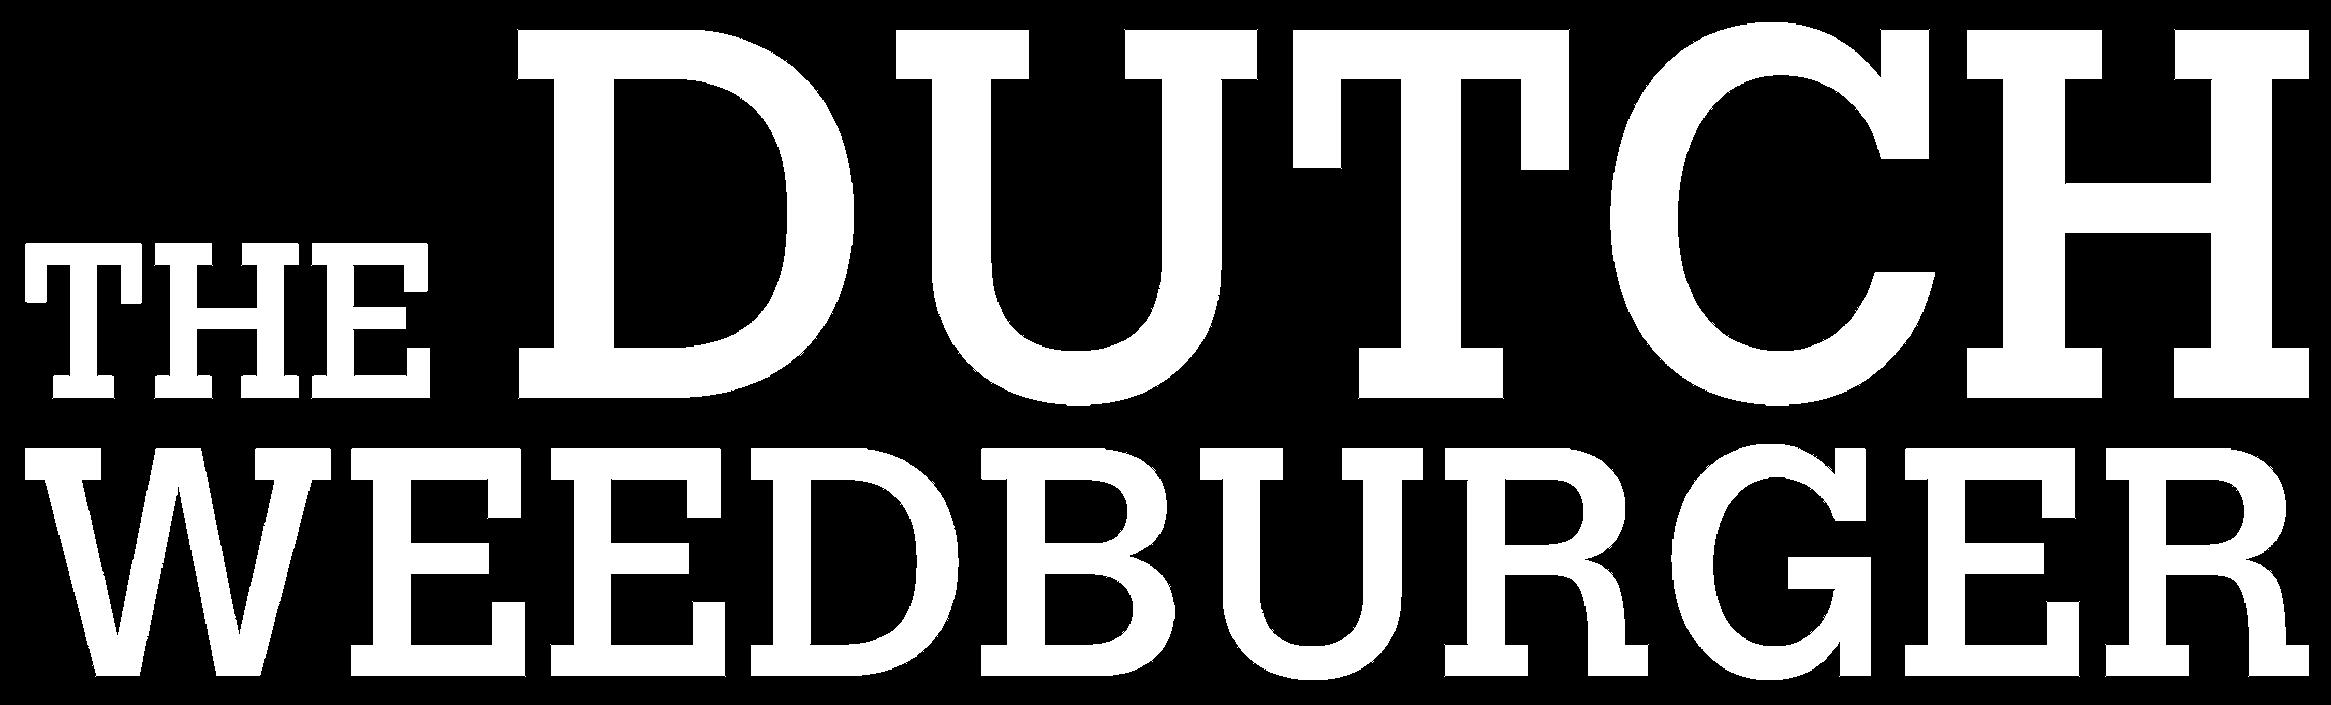 Wit-logo-dutch weed